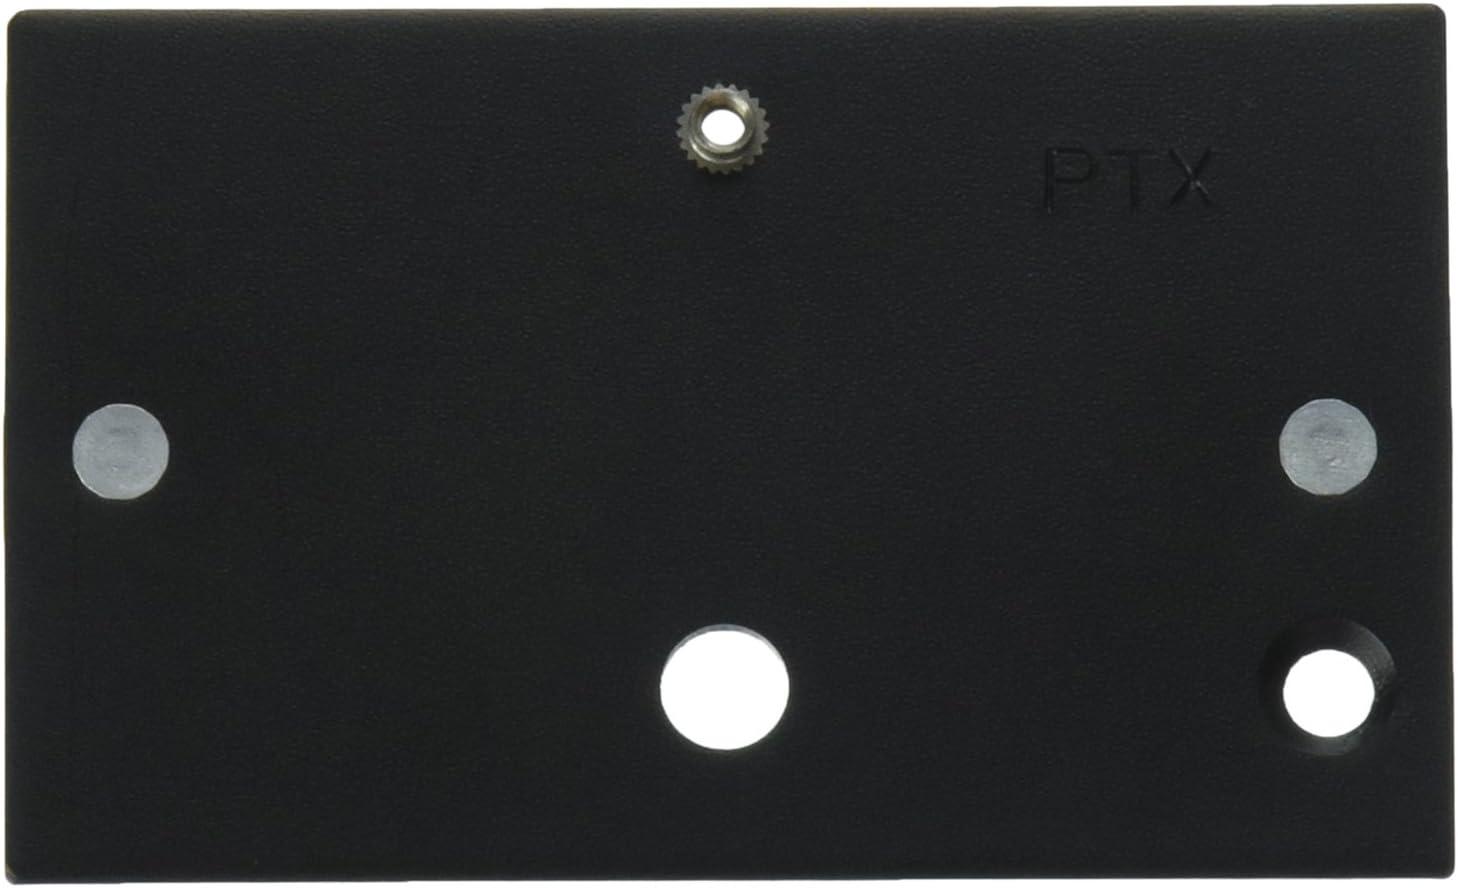 Black Stroboframe 300-PTX Anti-Twist Plate for Pentax 645